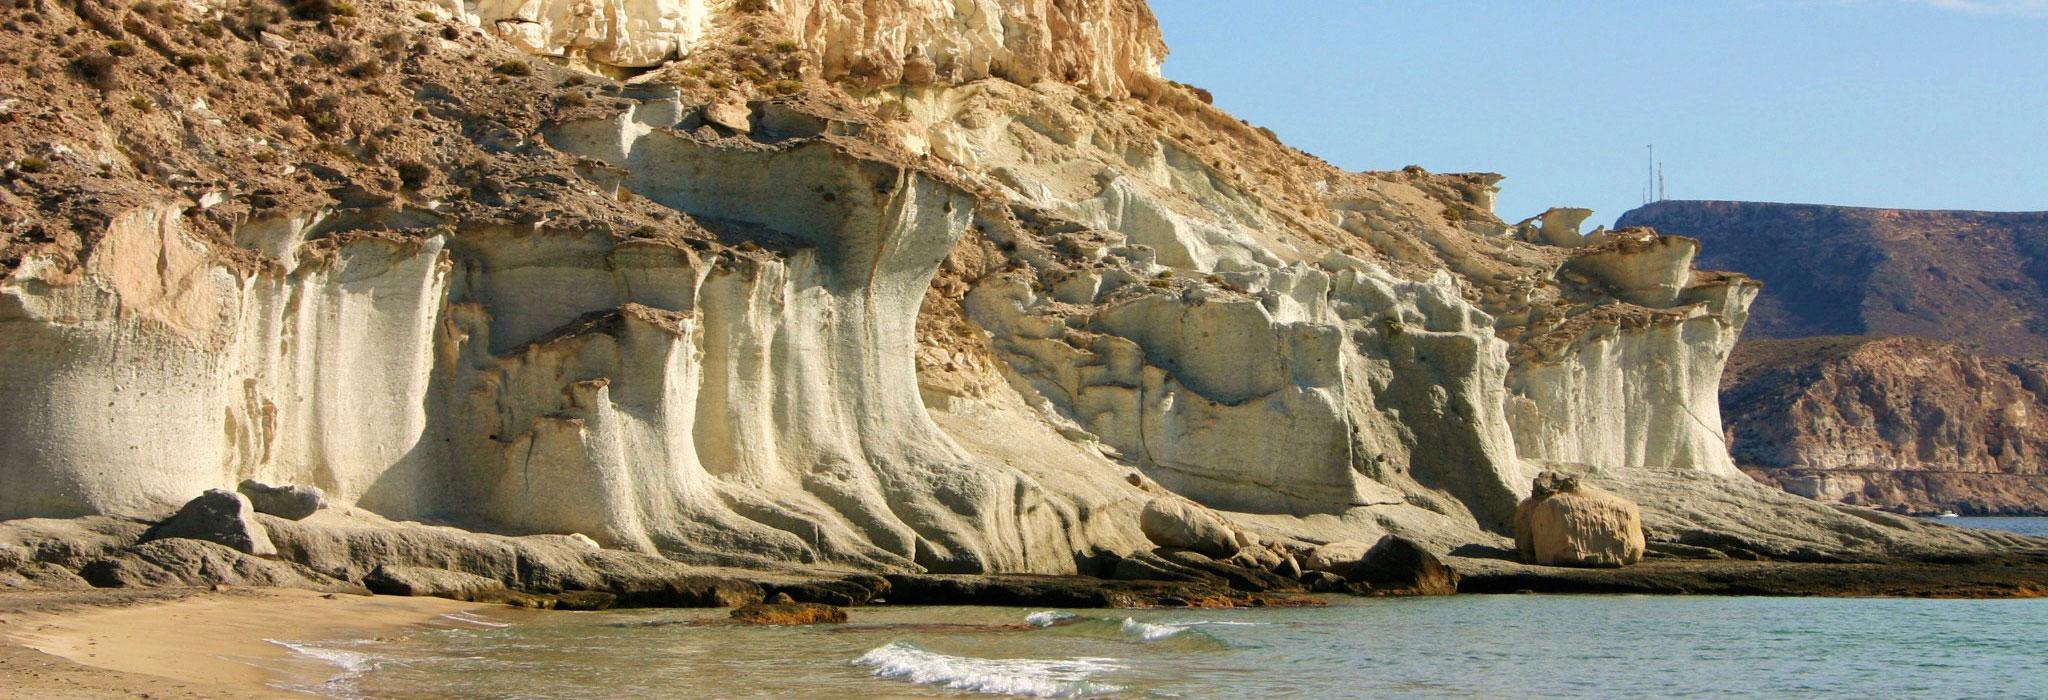 Trip to Cabo de gata beach, Almeria southern spain